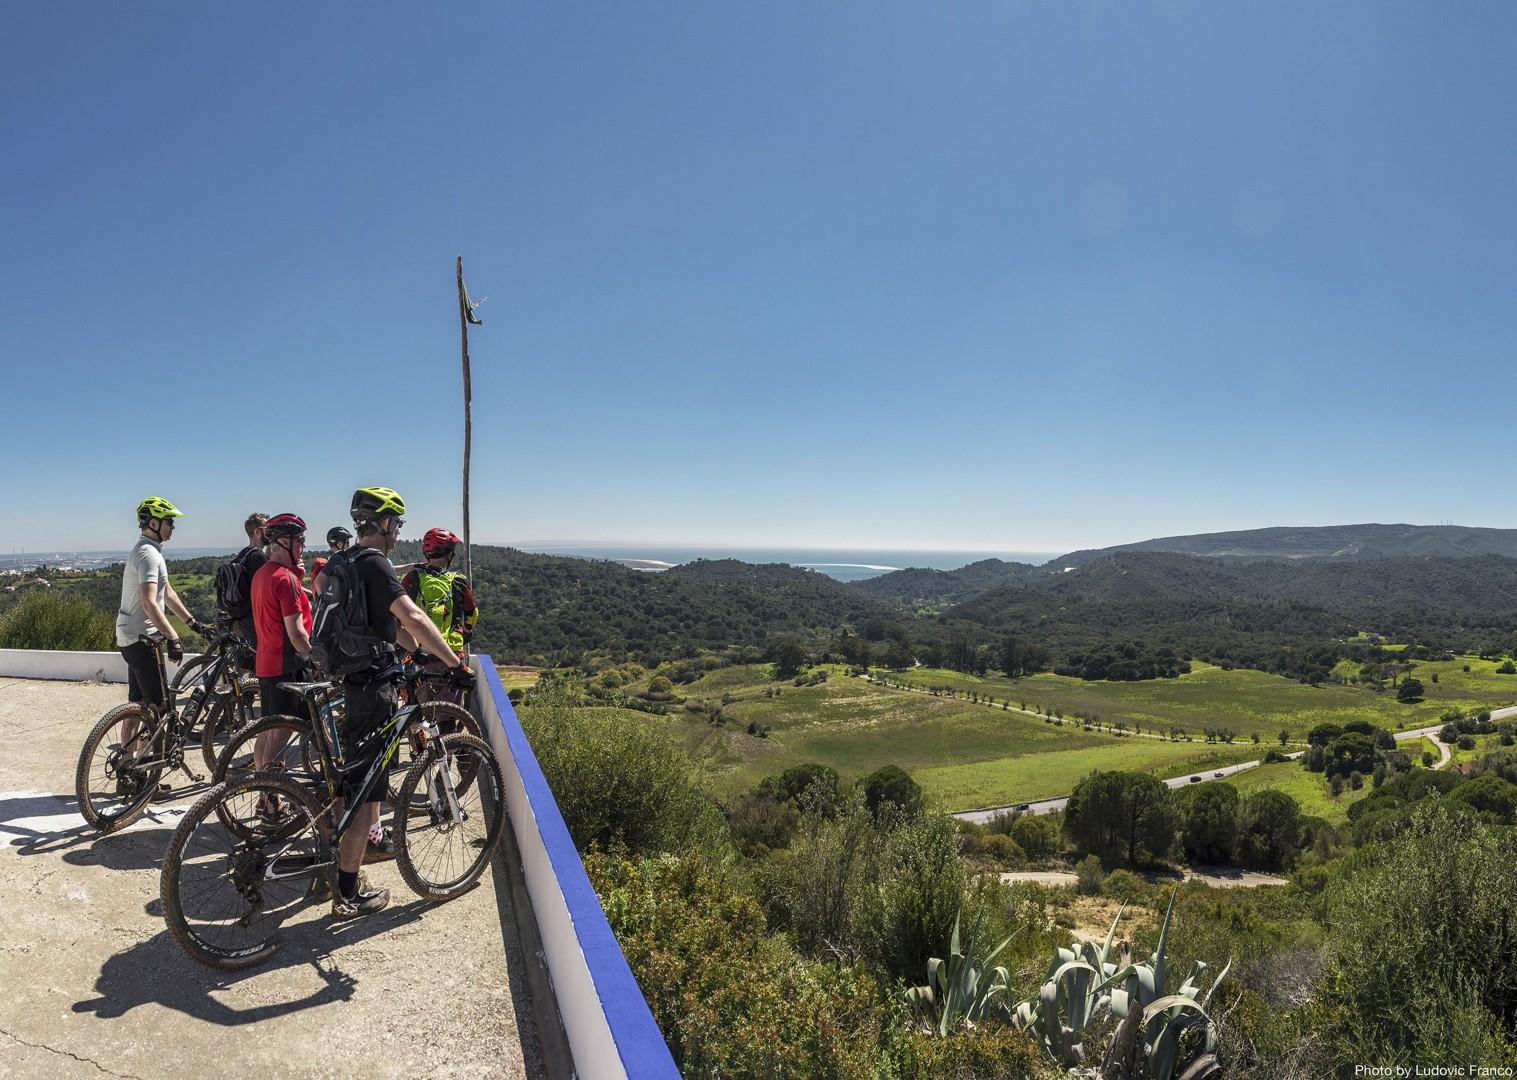 scenic-group-guided-mtb-cycling-holiday-serra-de-grandola.jpg - Portugal - Atlantic Trails - Guided Mountain Bike Holiday - Mountain Biking